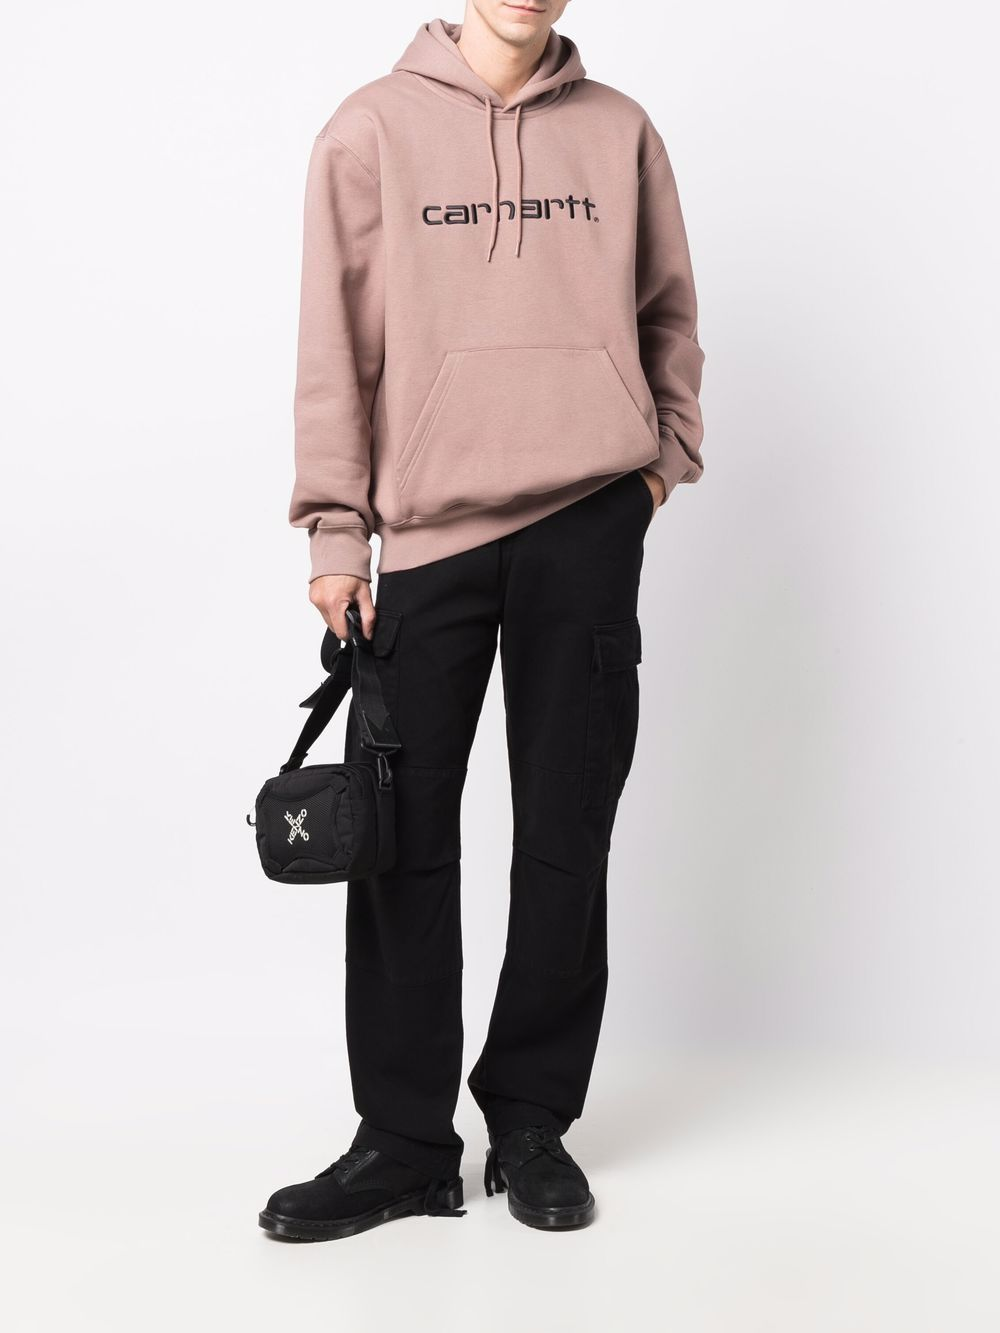 felpa con cappuccio uomo rosa antico in cotone CARHARTT WIP   Felpe   I0302300J7.XX